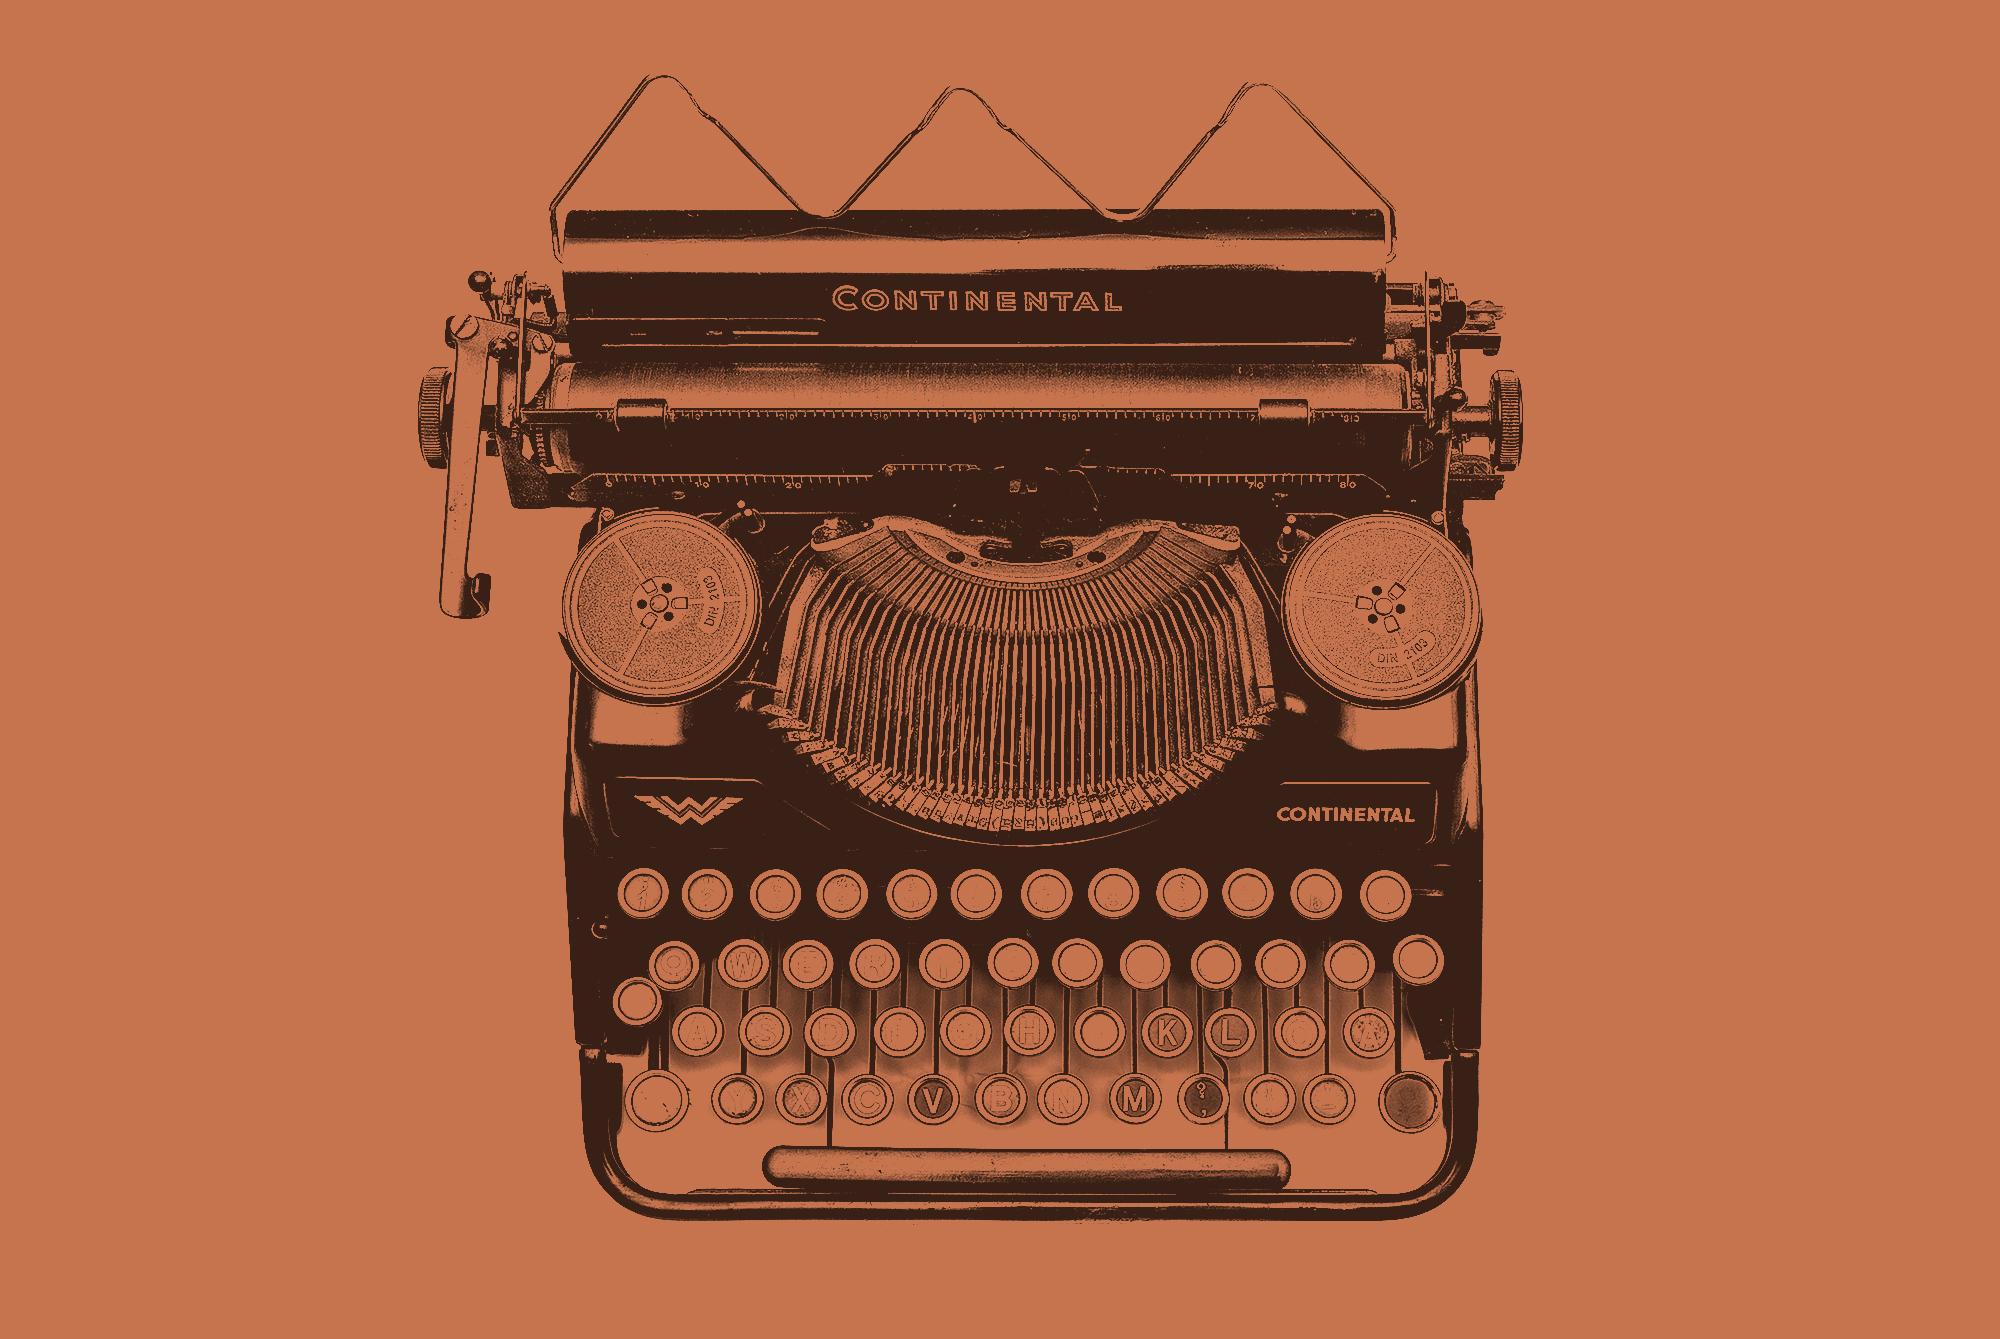 Søvnløs Typewriter